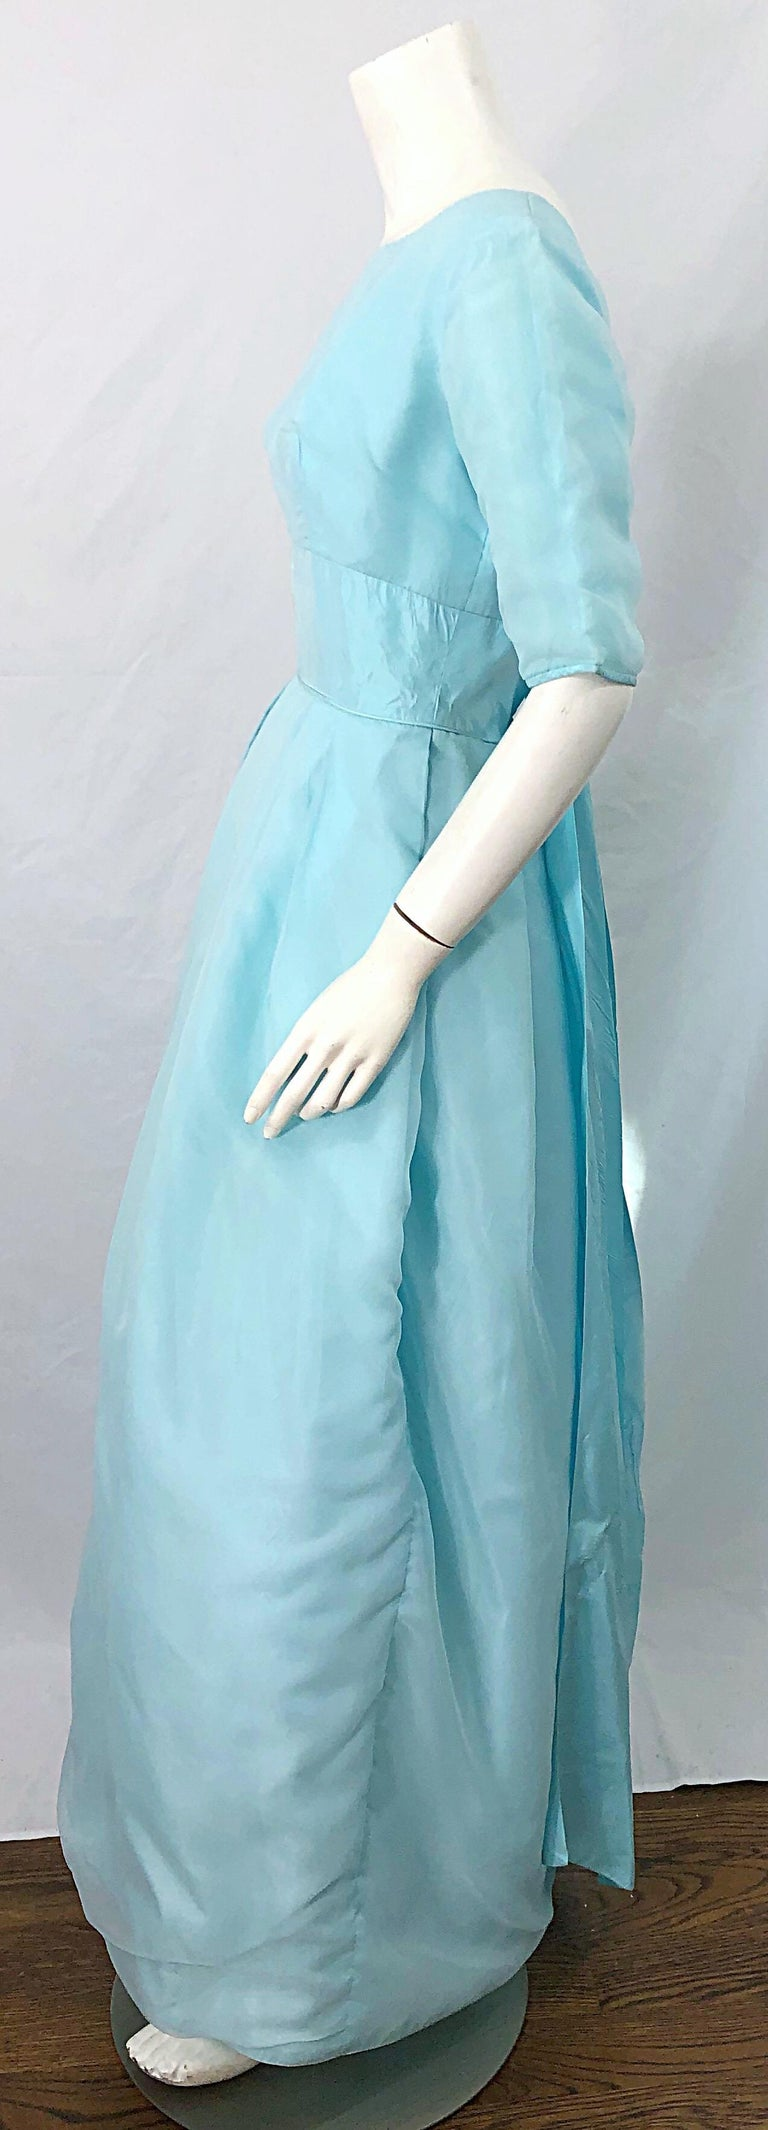 Women's 1950s Demi Couture Light Blue Cinderella Silk Chiffon Taffeta 3/4 Sleeves Gown For Sale